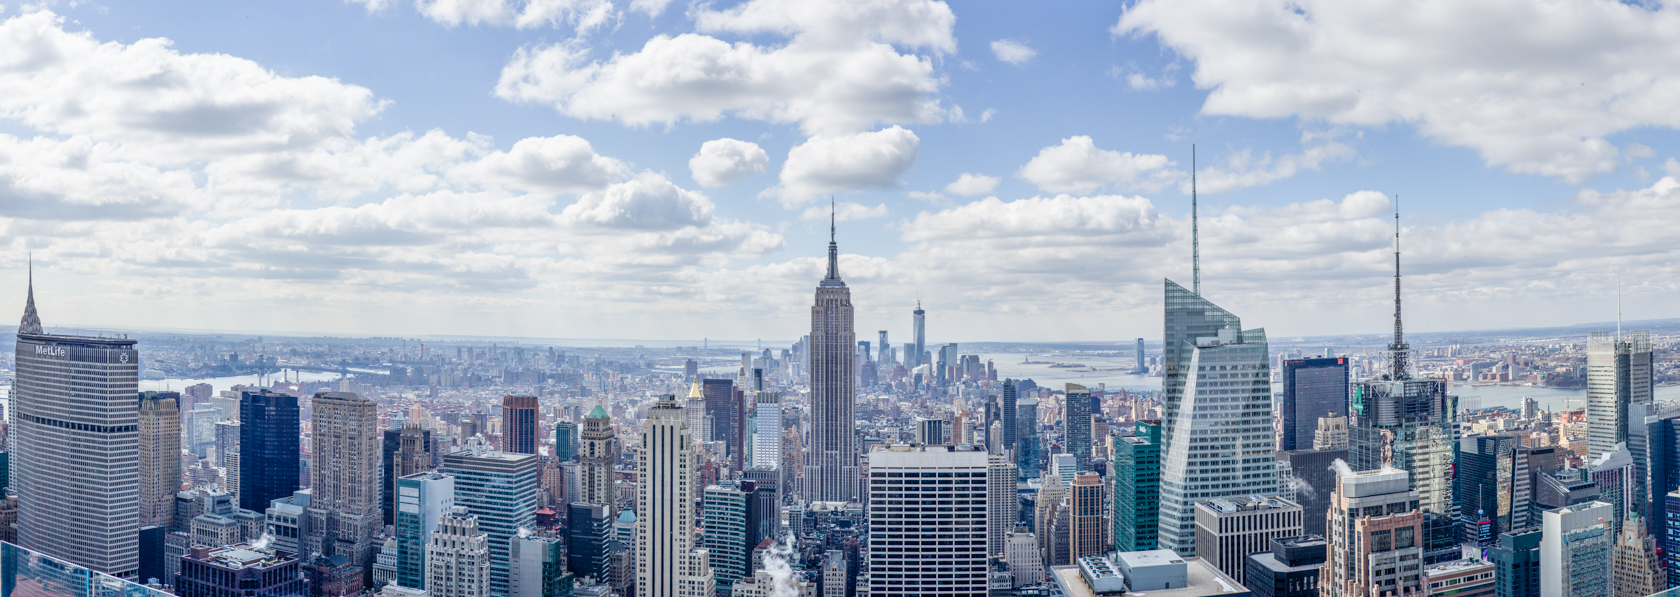 NYC-Pano_1-2